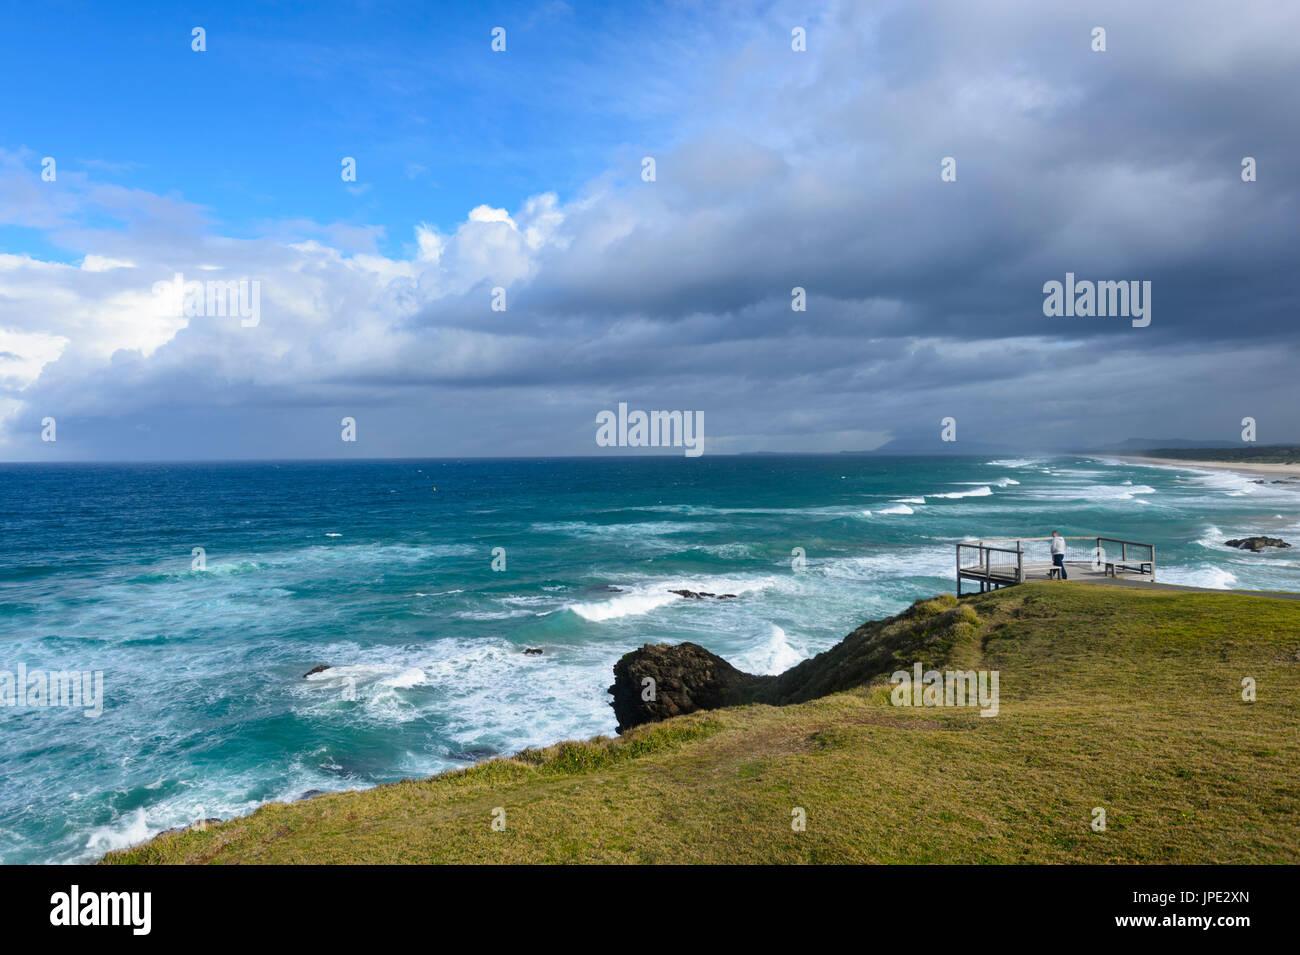 Blick von Heften, Point, Port Macquarie, New South Wales, NSW, Australien Stockbild